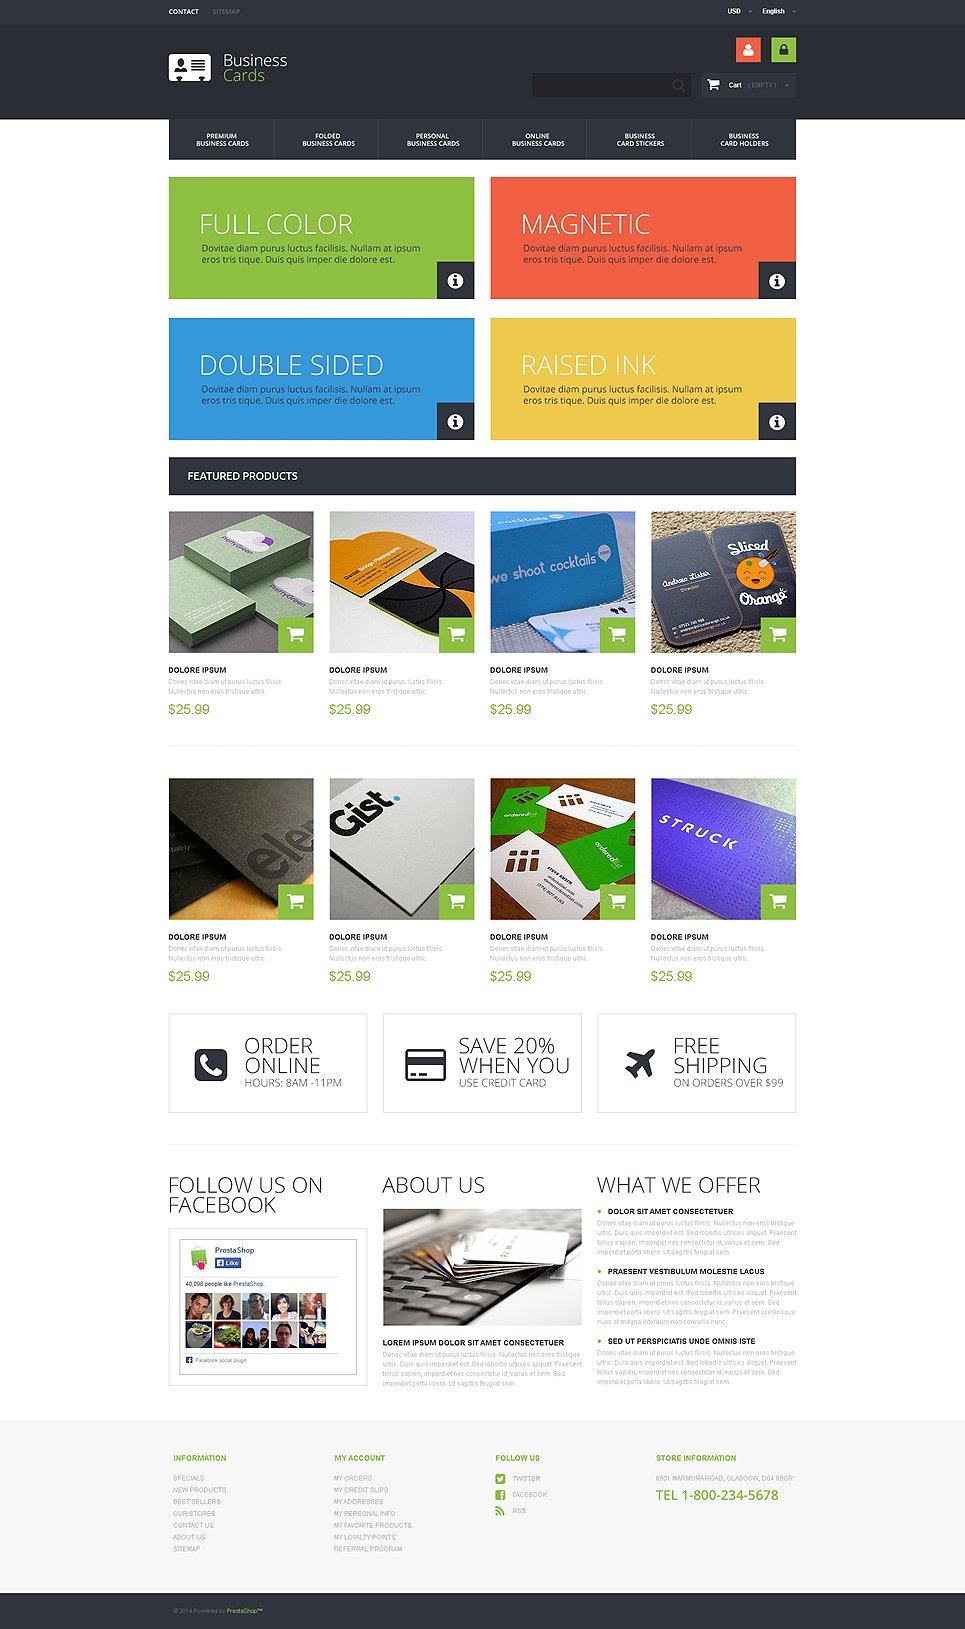 Business cards store prestashop theme 49339 colourmoves